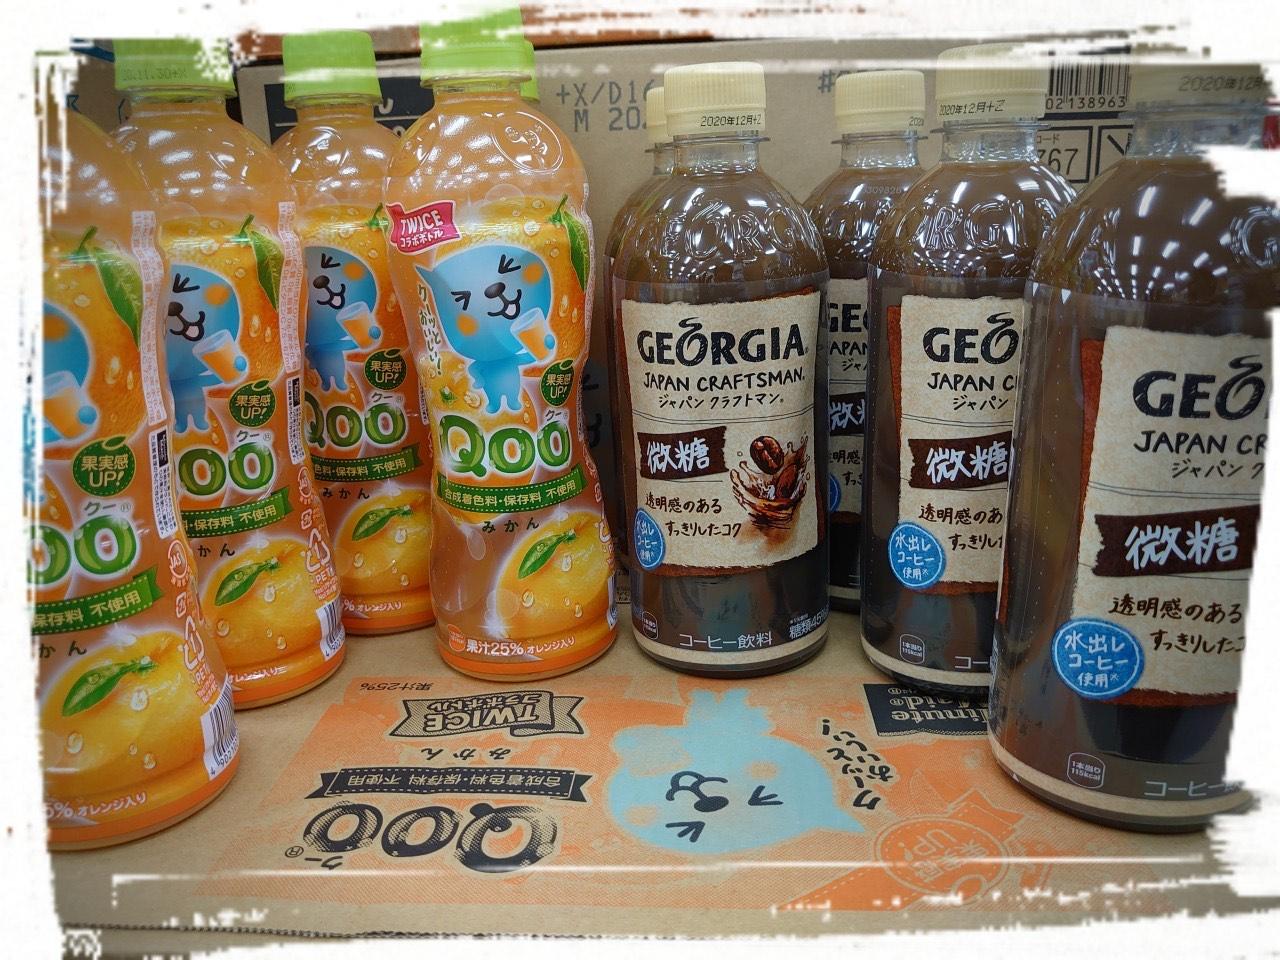 Qooオレンジ425ml・ジョージアジャパンクラフトマン微糖500ml